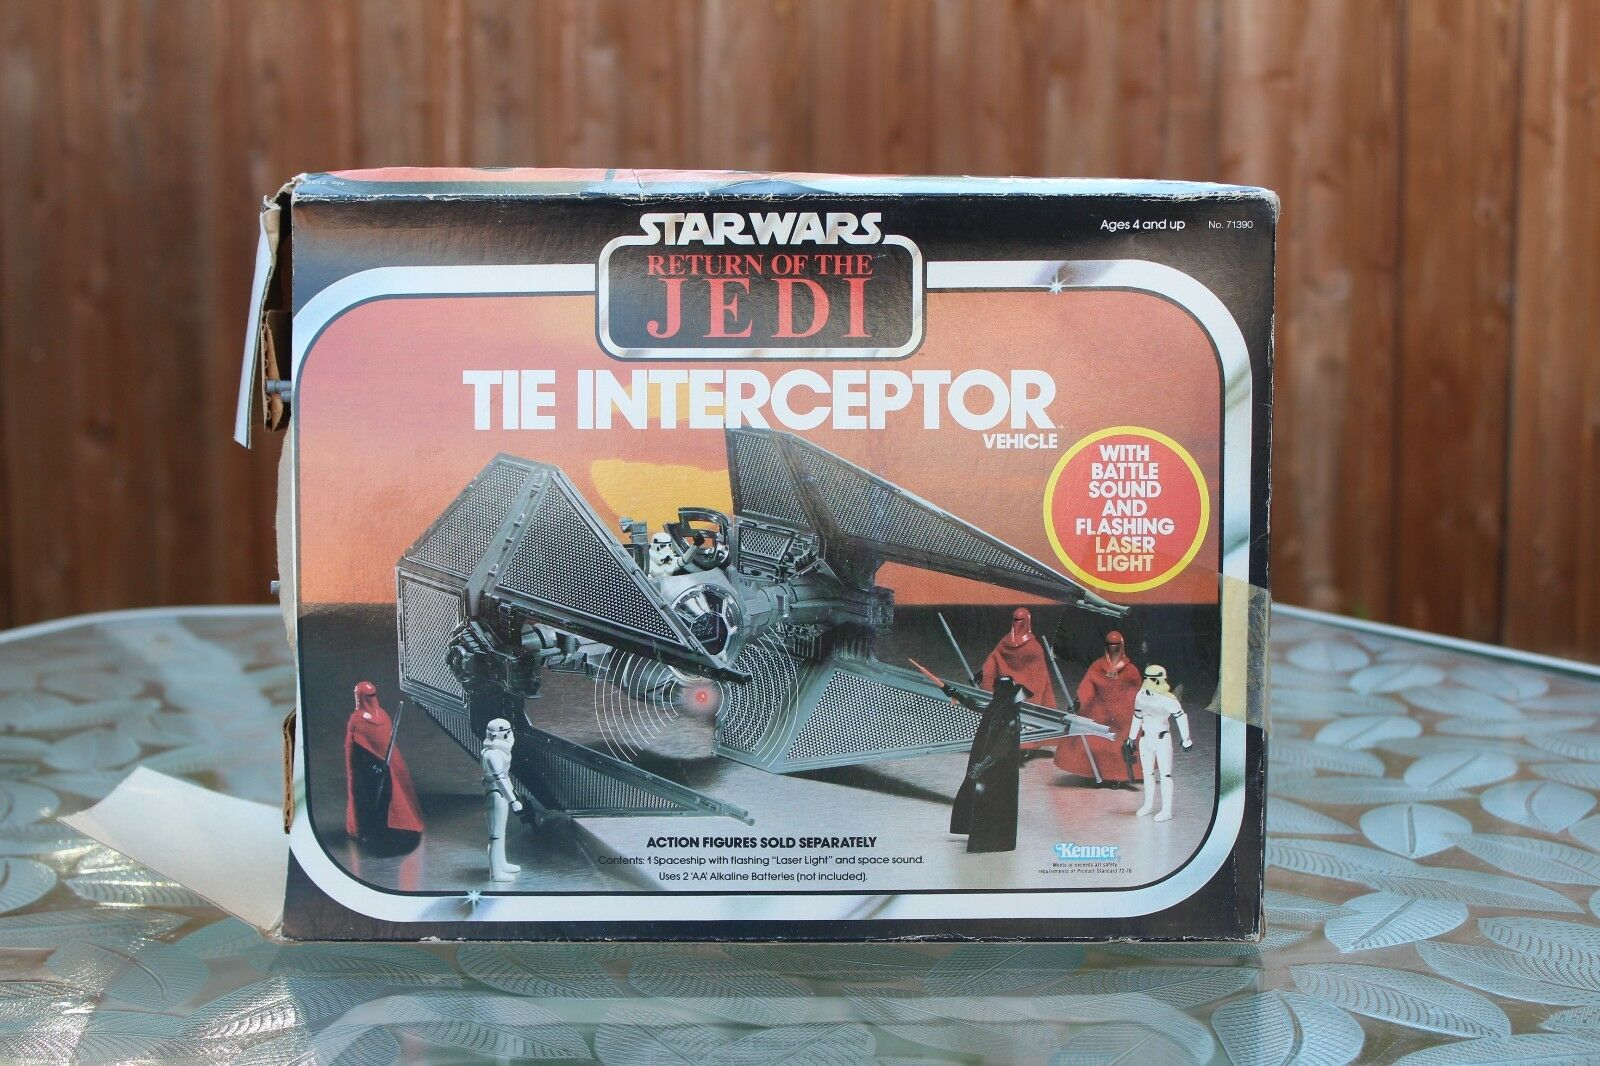 Star Wars Return of the Jedi Interceptor battle Sound & Flashing Laser Light NIB